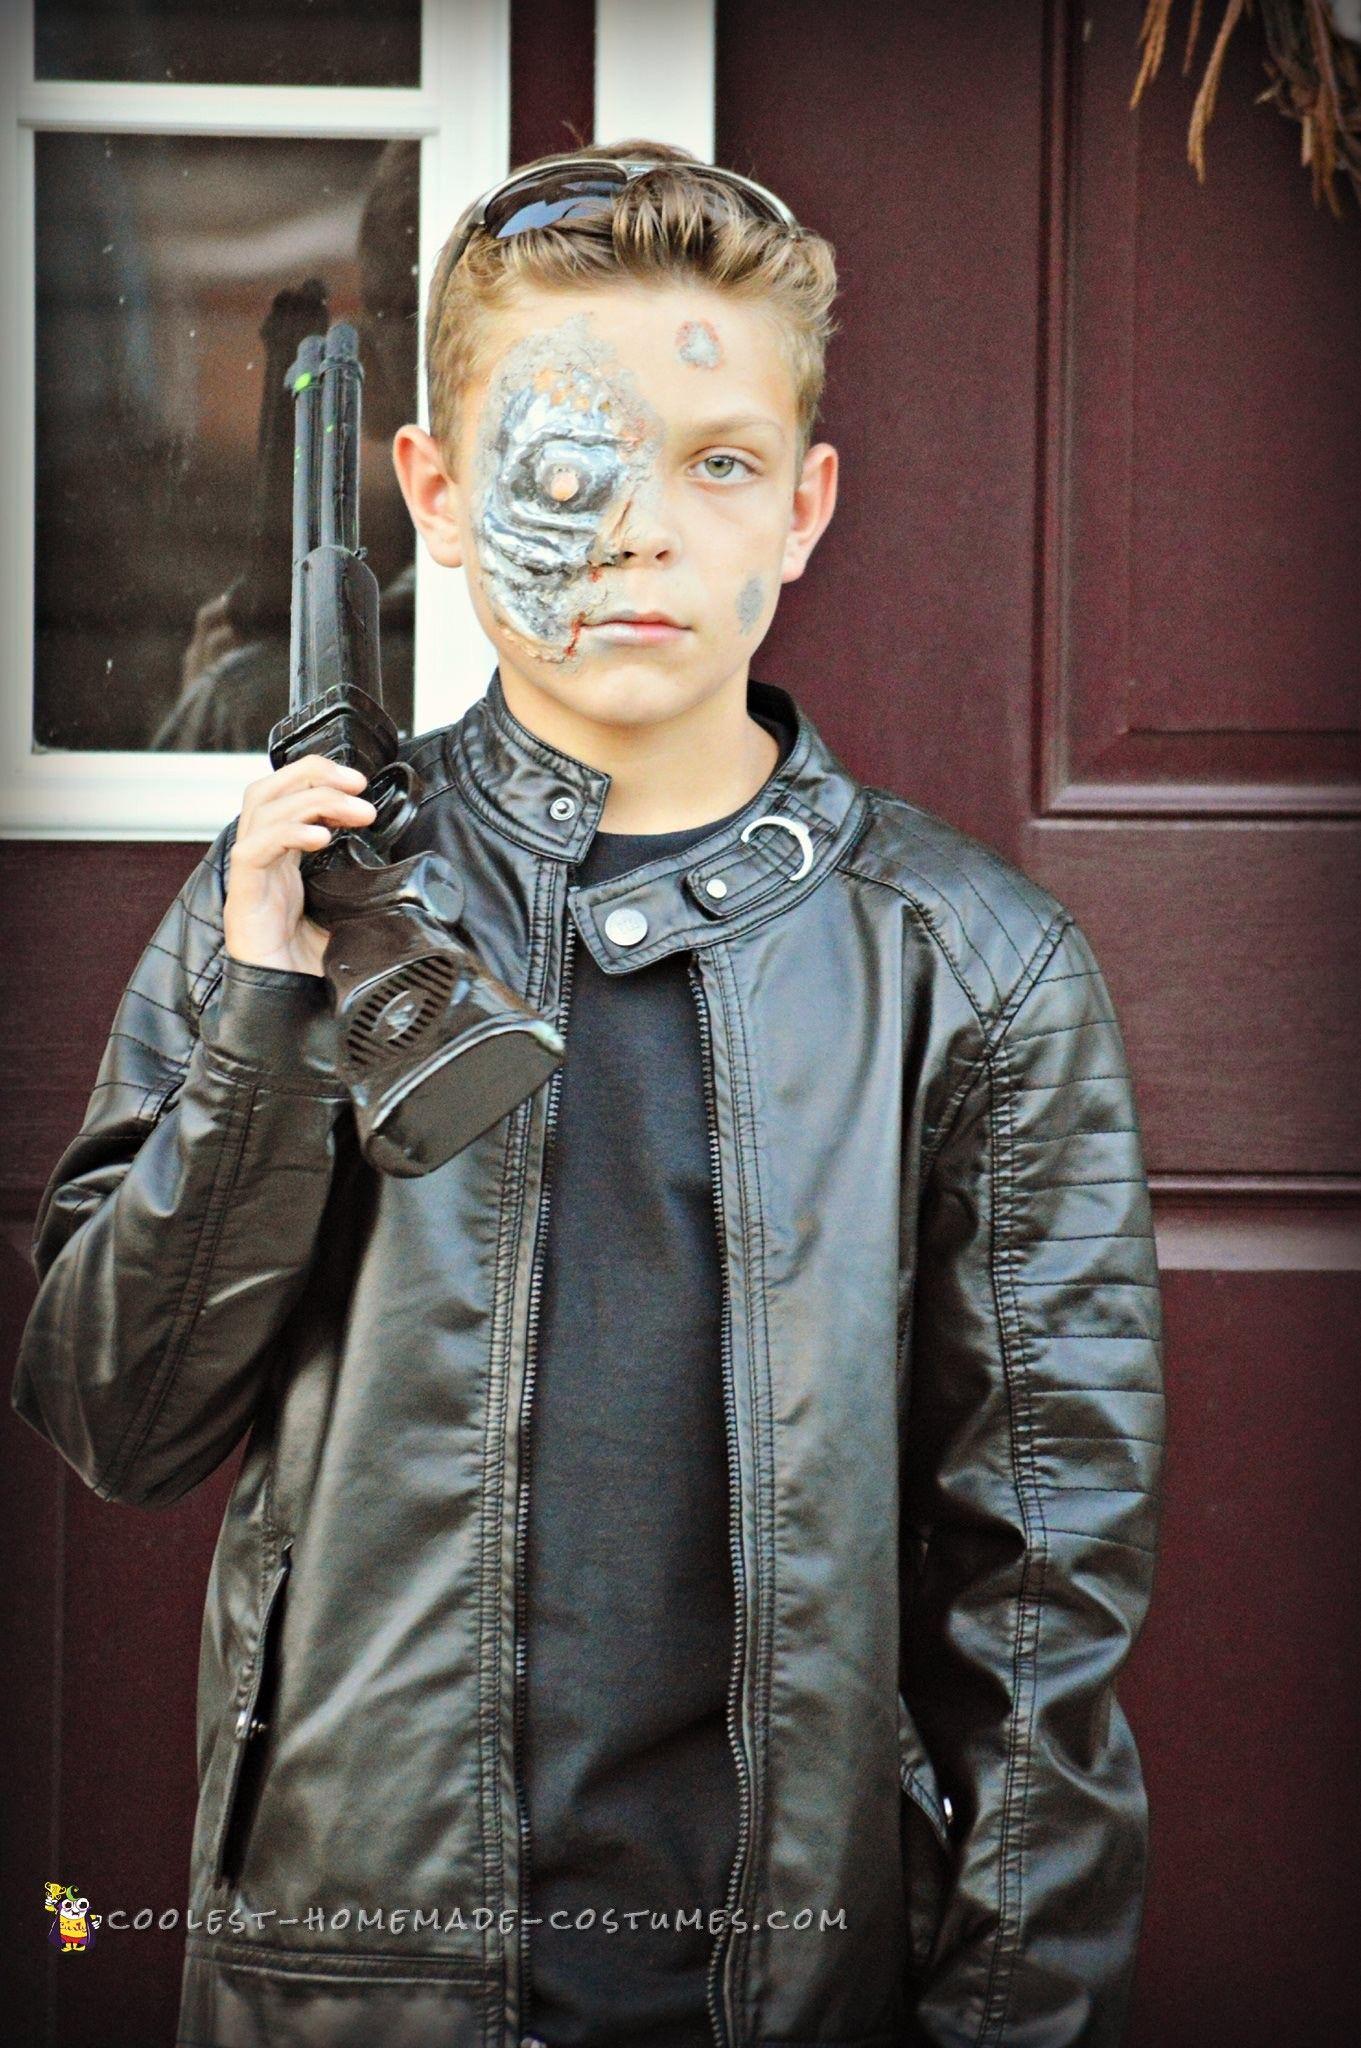 Terminator Costume for Tween Boy Terminator costume